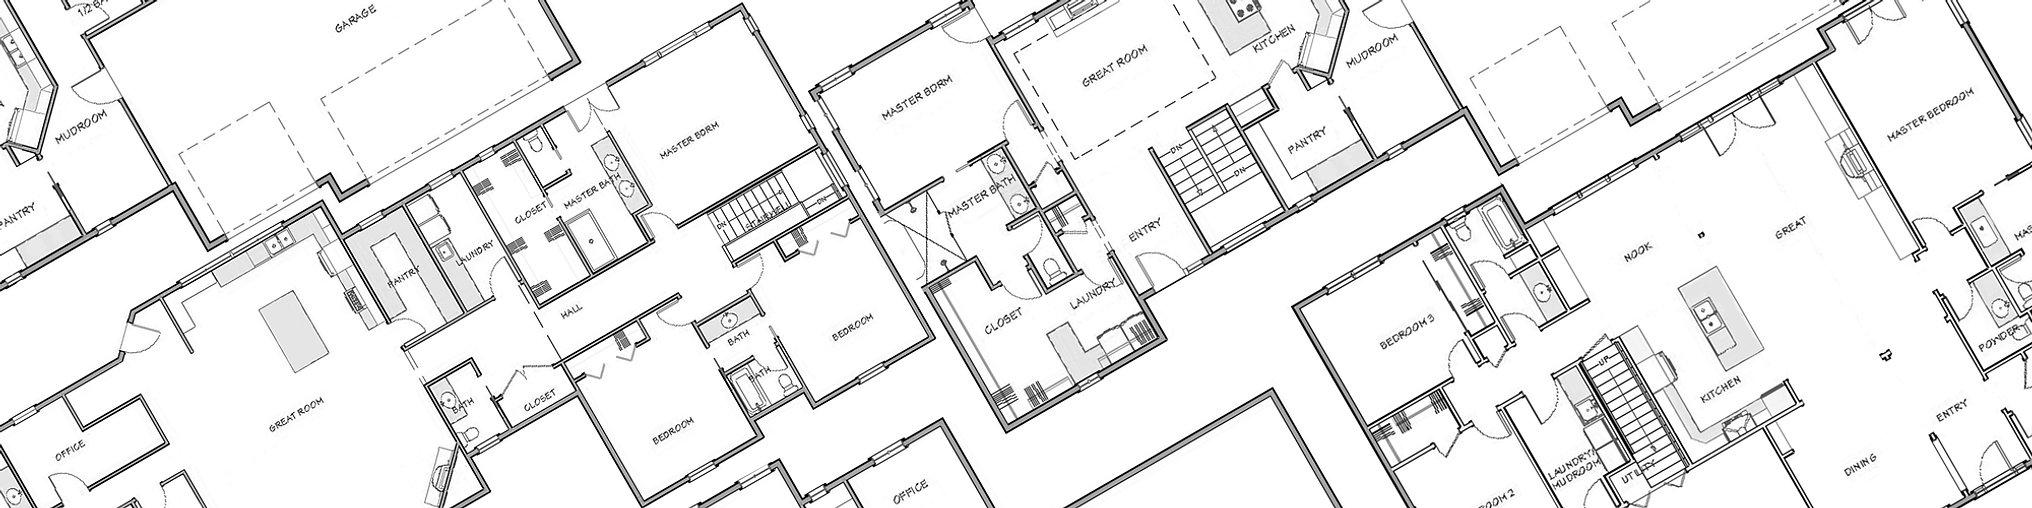 floorplan header.jpg